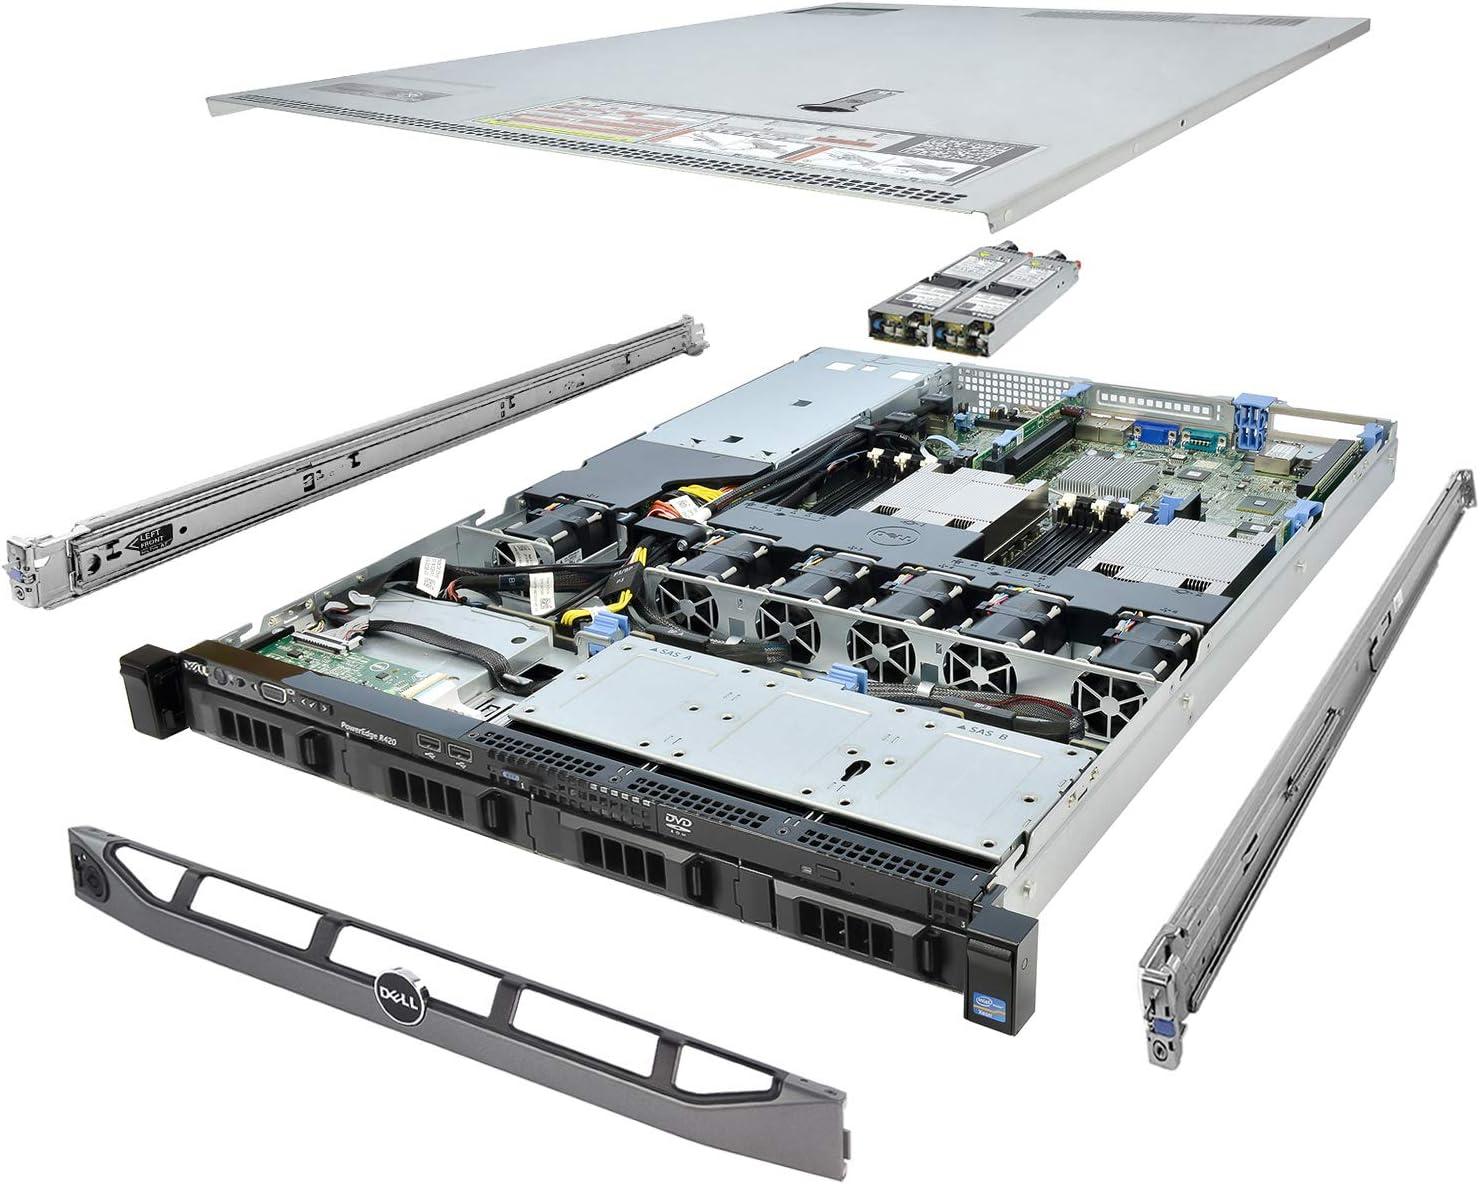 Dell PowerEdge R420 Server 2X E5-2430 2.20Ghz 12-Core 48GB 4X 1TB H710 Rails (Renewed)